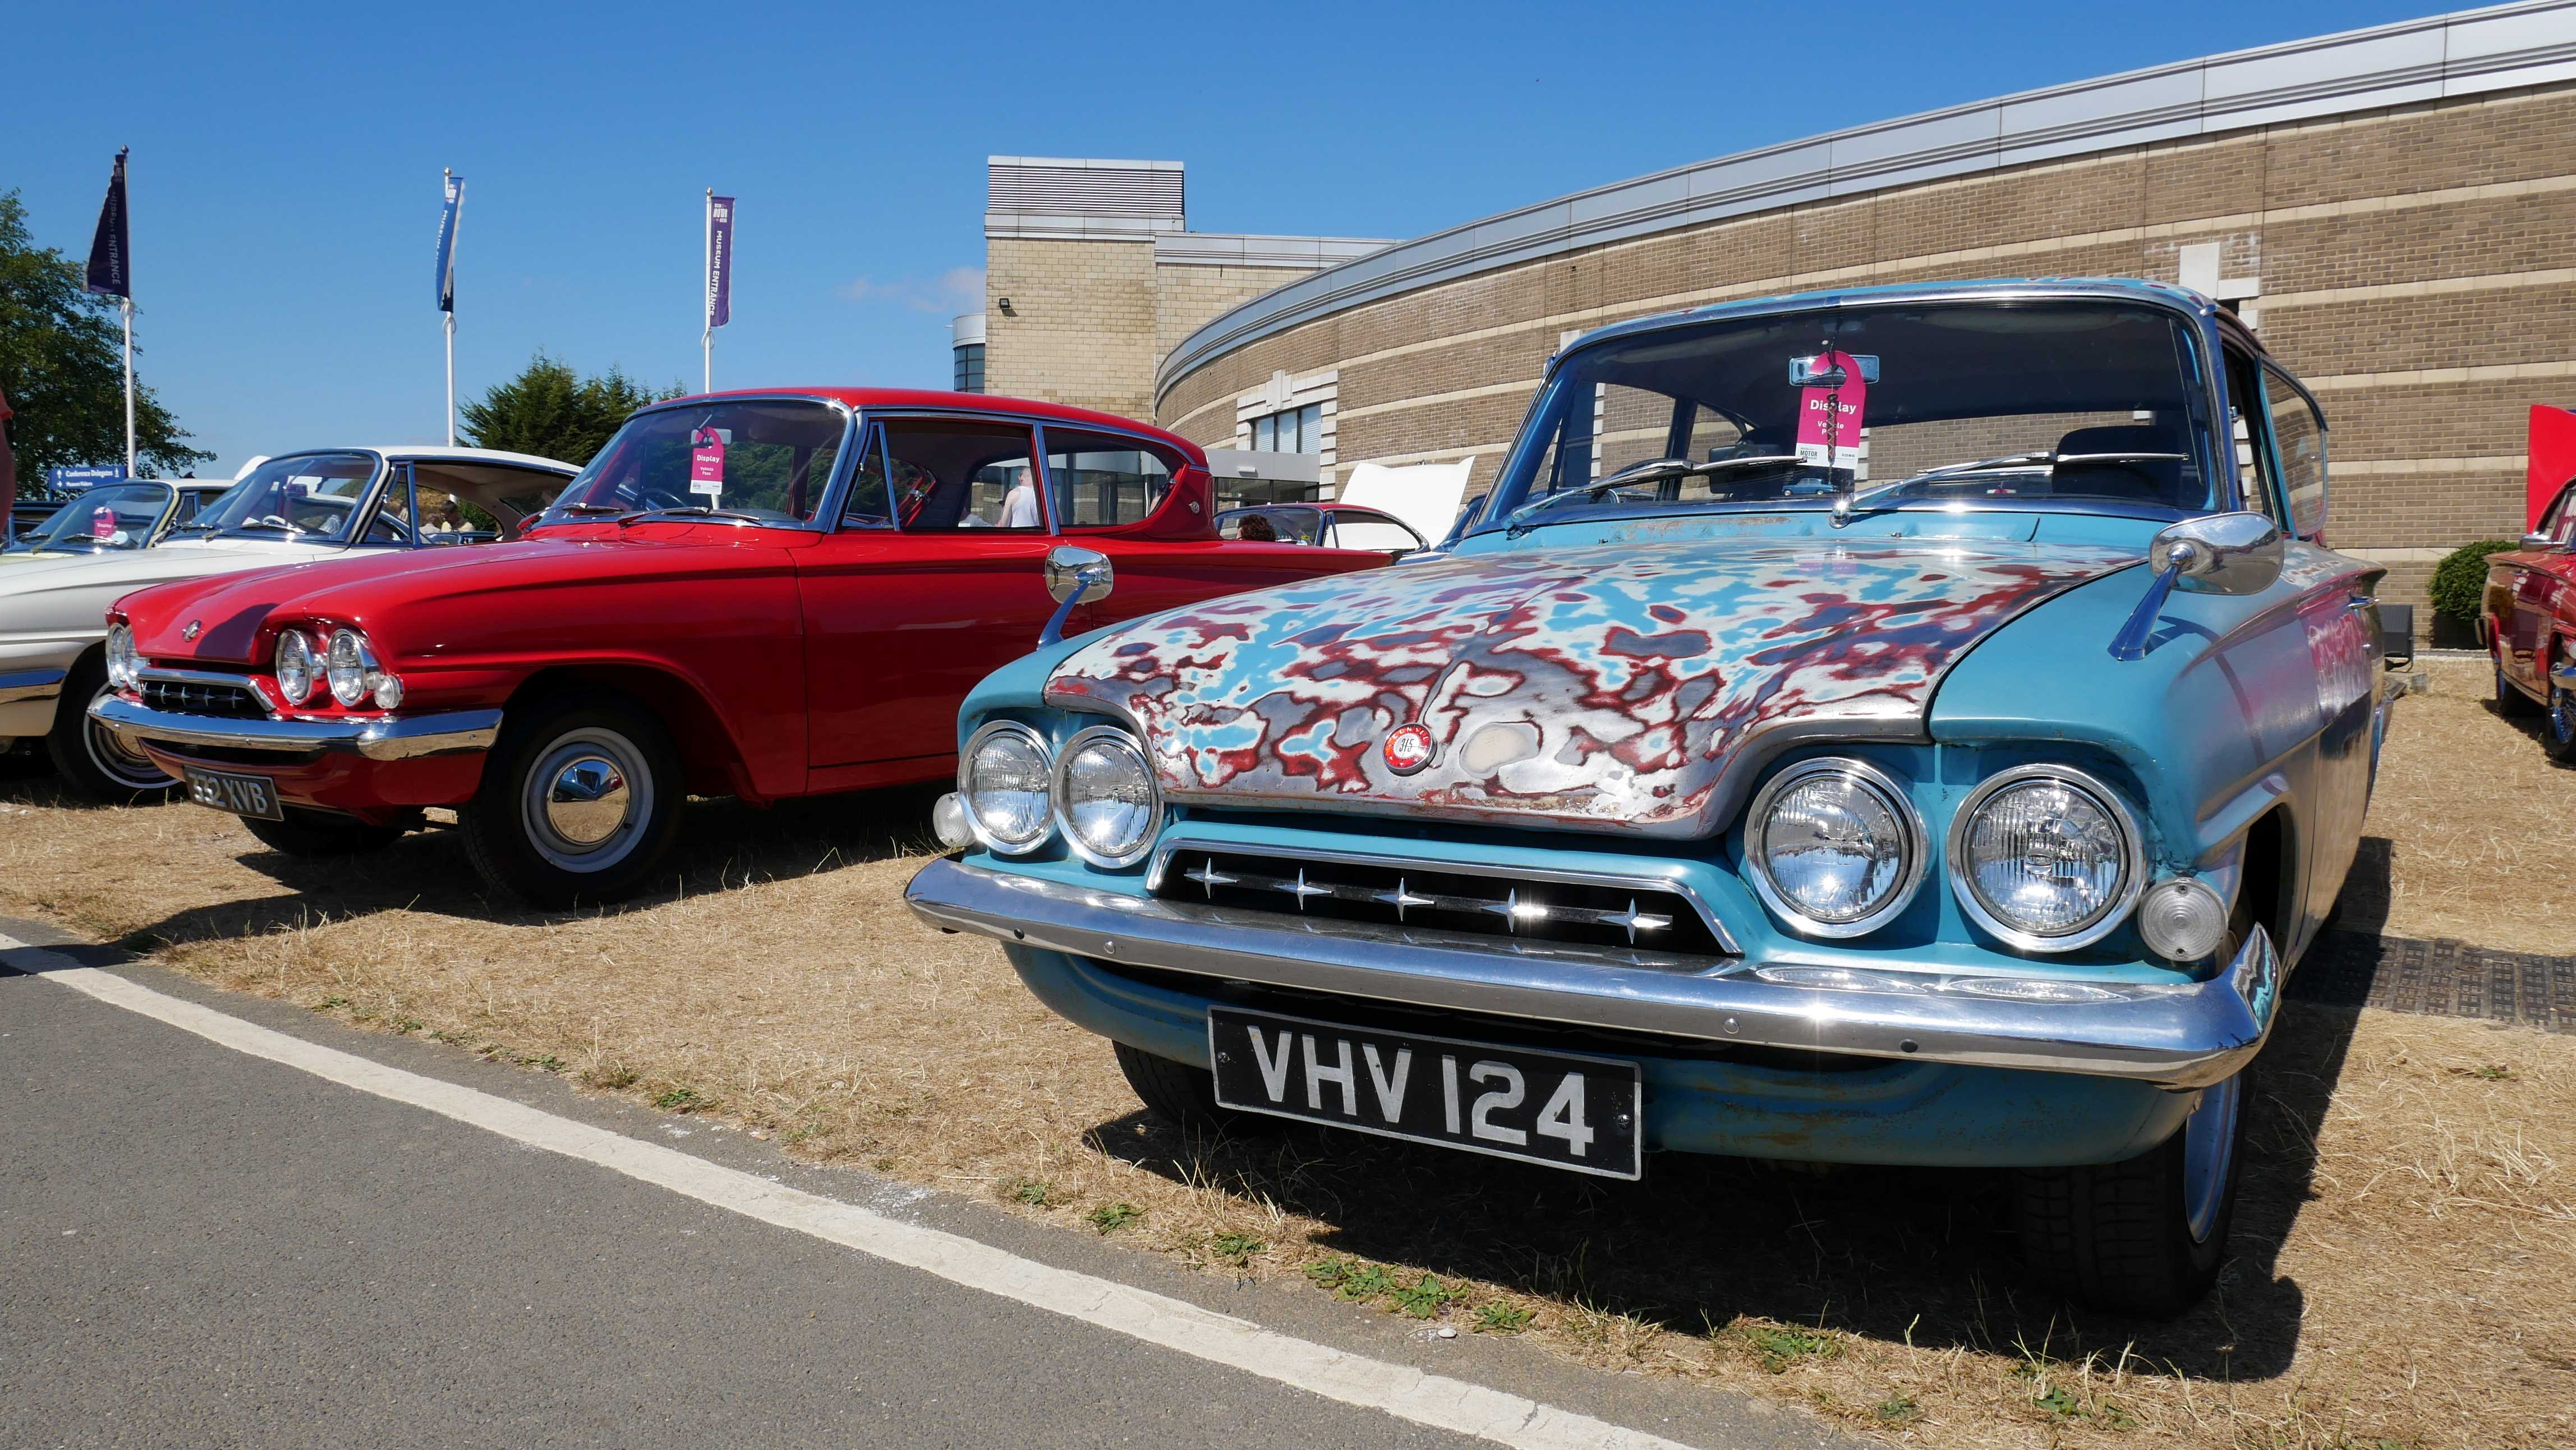 Automobile museum, Danish museum lands the 100th BAC Mono supercar, ClassicCars.com Journal